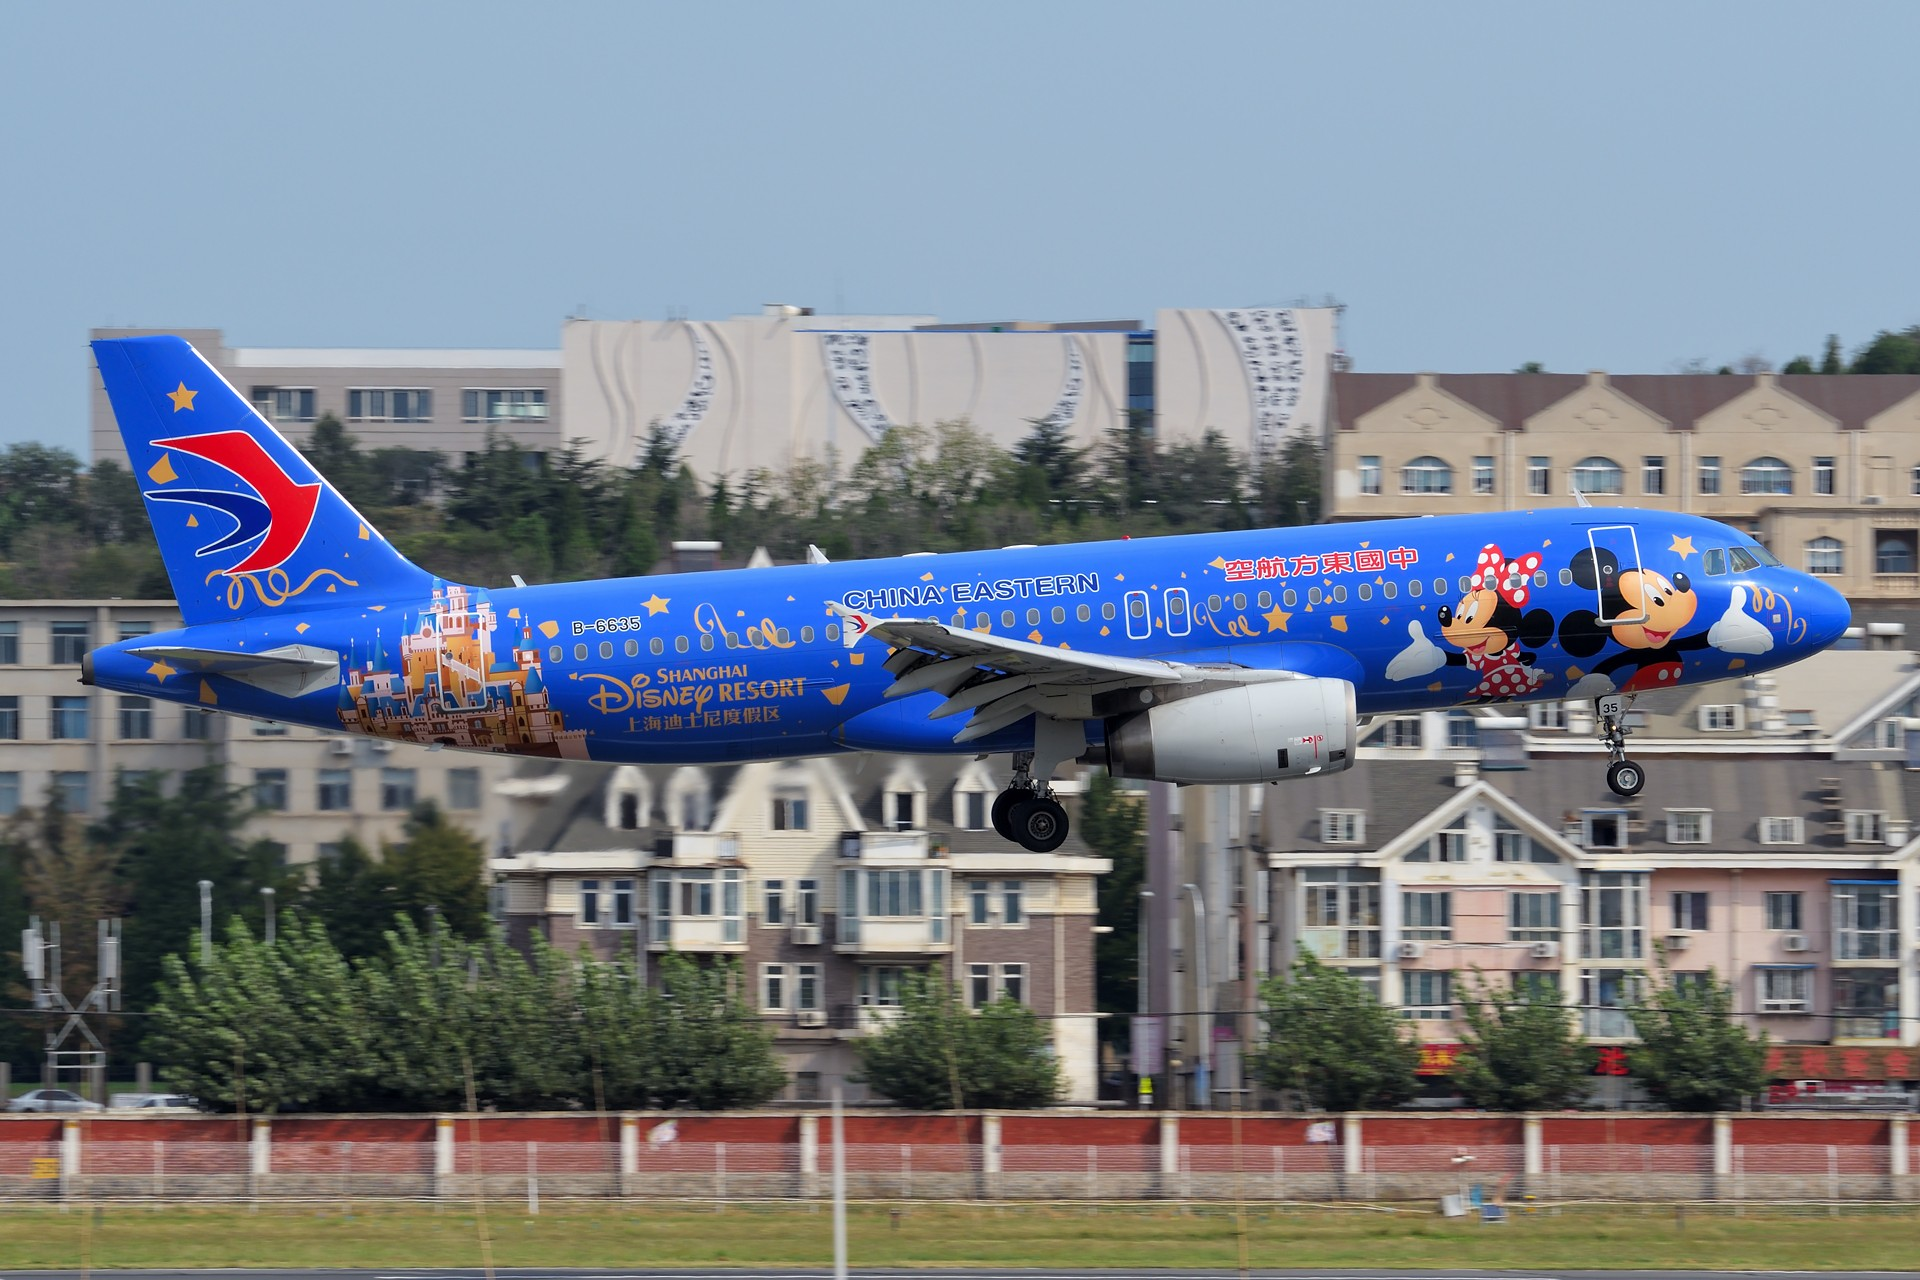 Re:[原创]★[DLC]一点有趣的事情(国庆加点儿料)★ AIRBUS A320-200 B-6635 中国大连国际机场